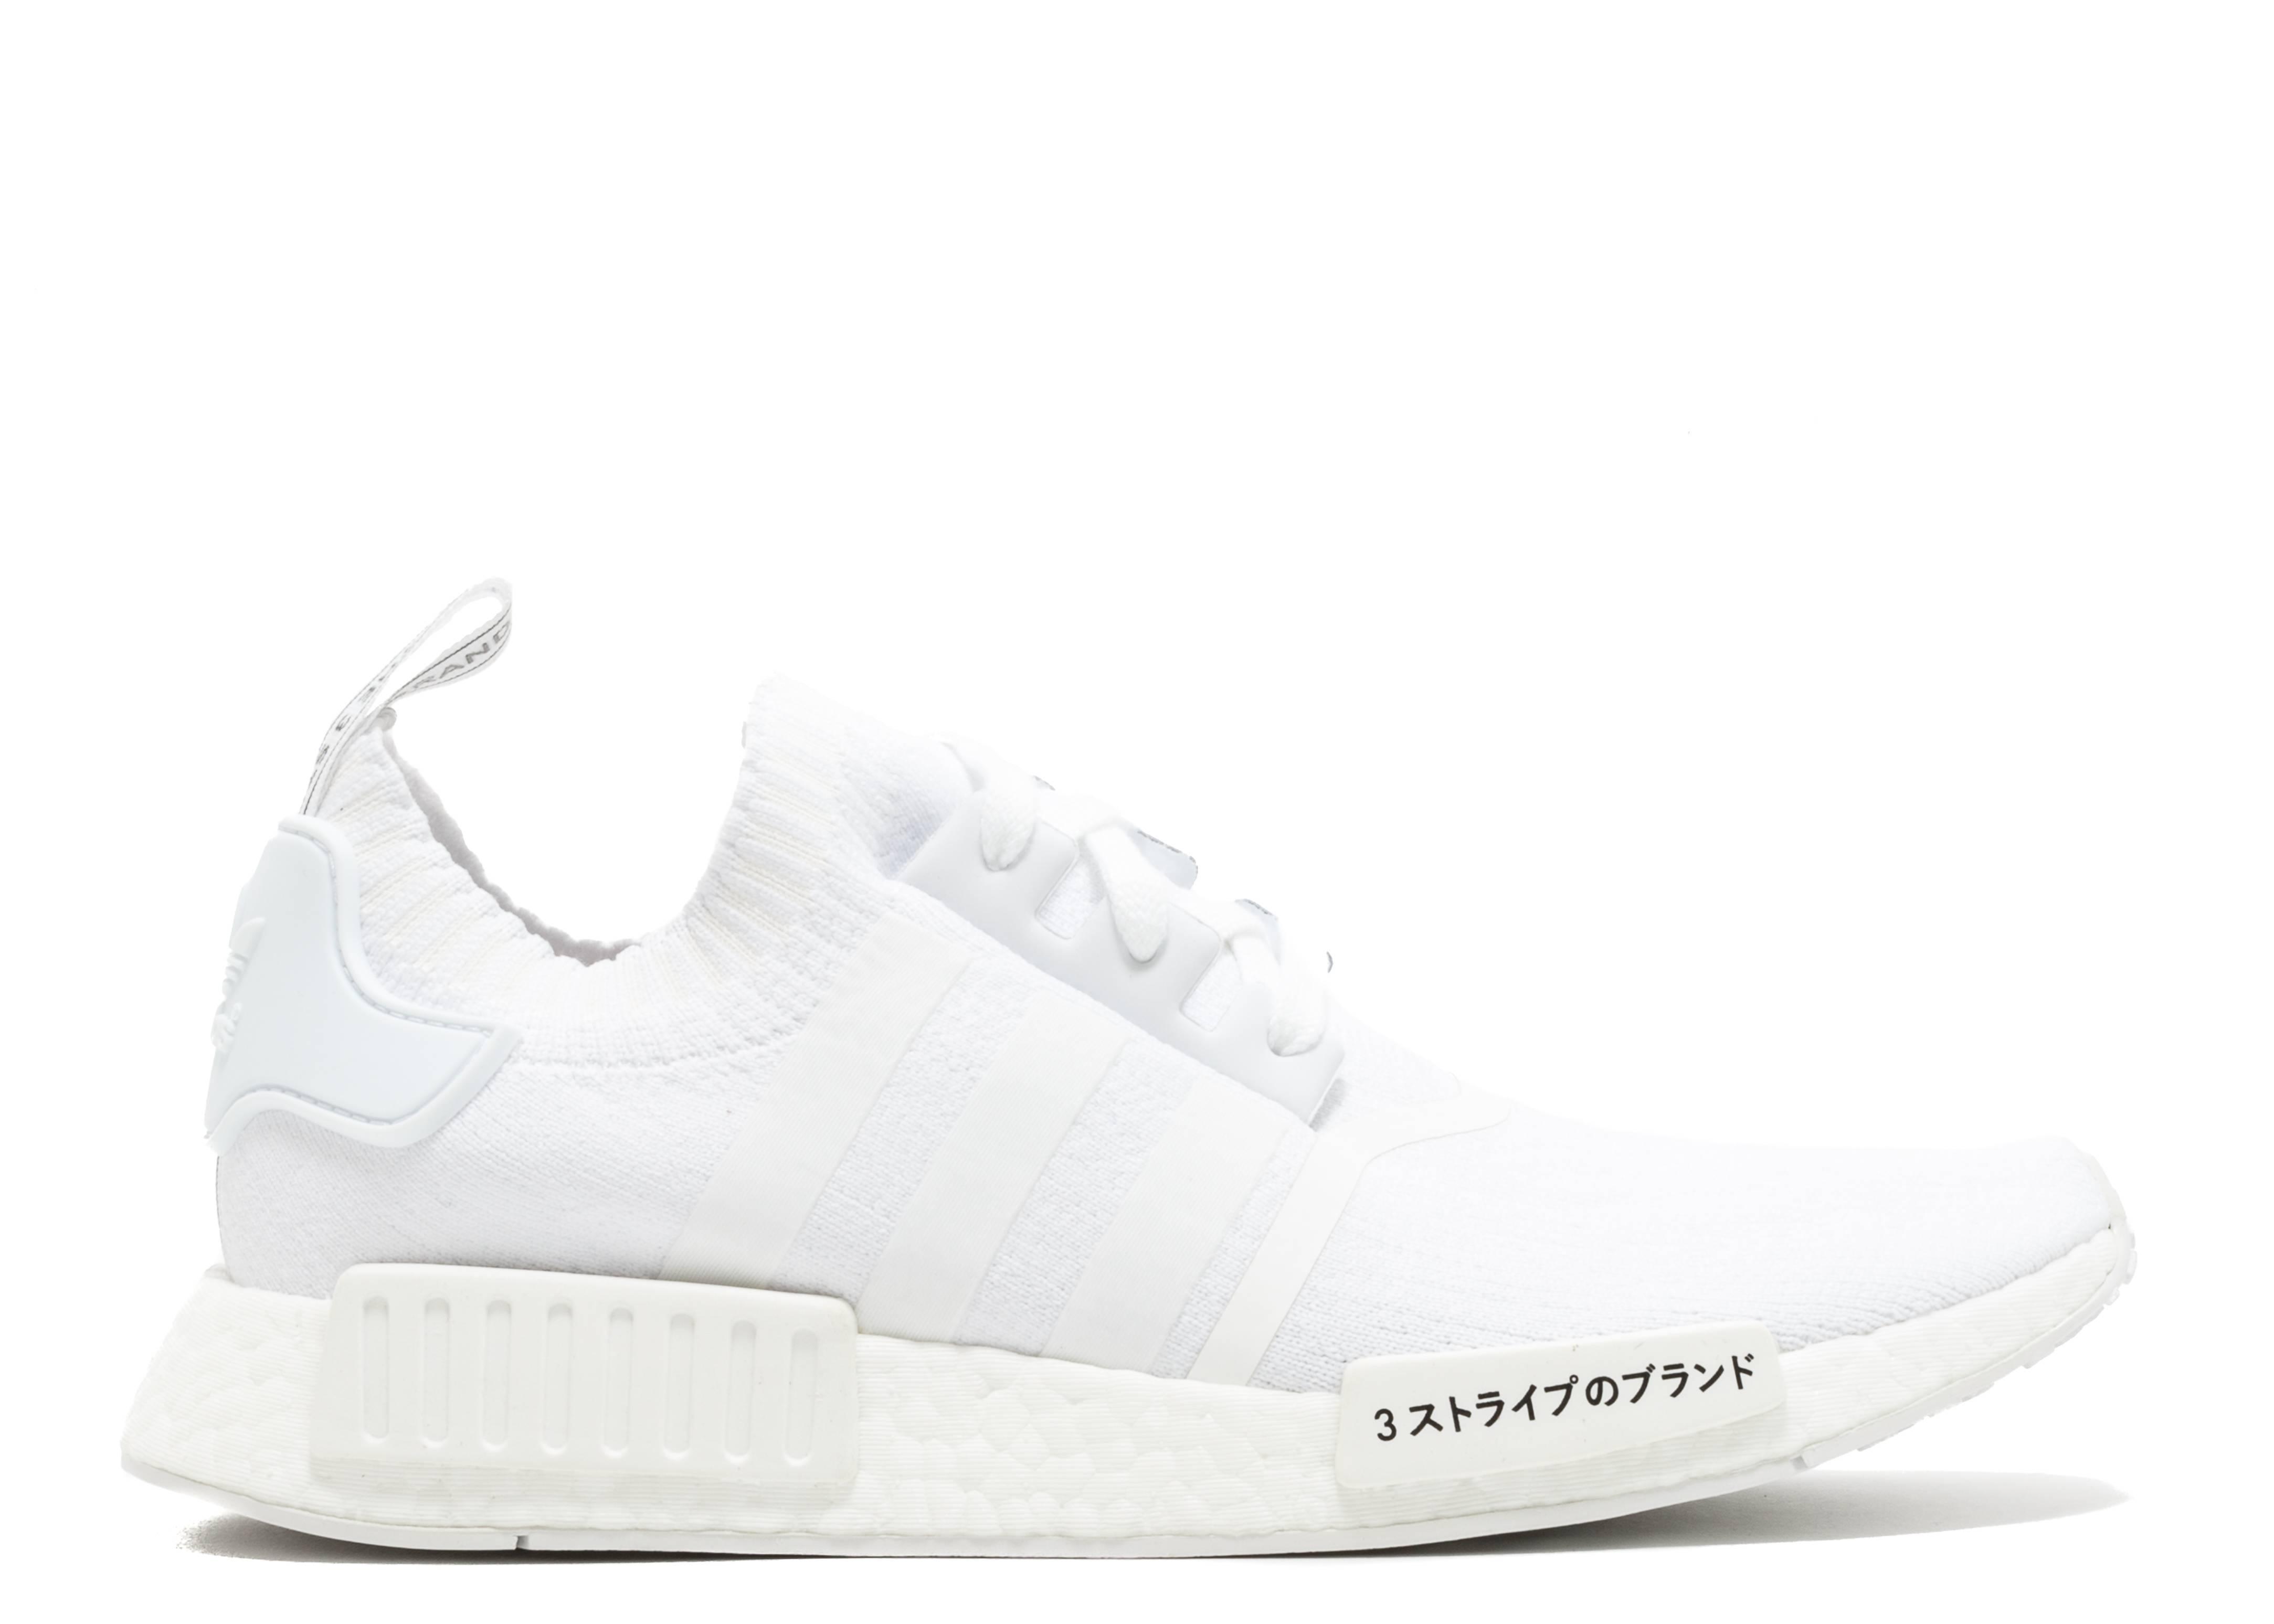 adidas Originals NMD R1 PK Primeknit Runner Boost Triple White 'Japan Pack' white white BZ0221